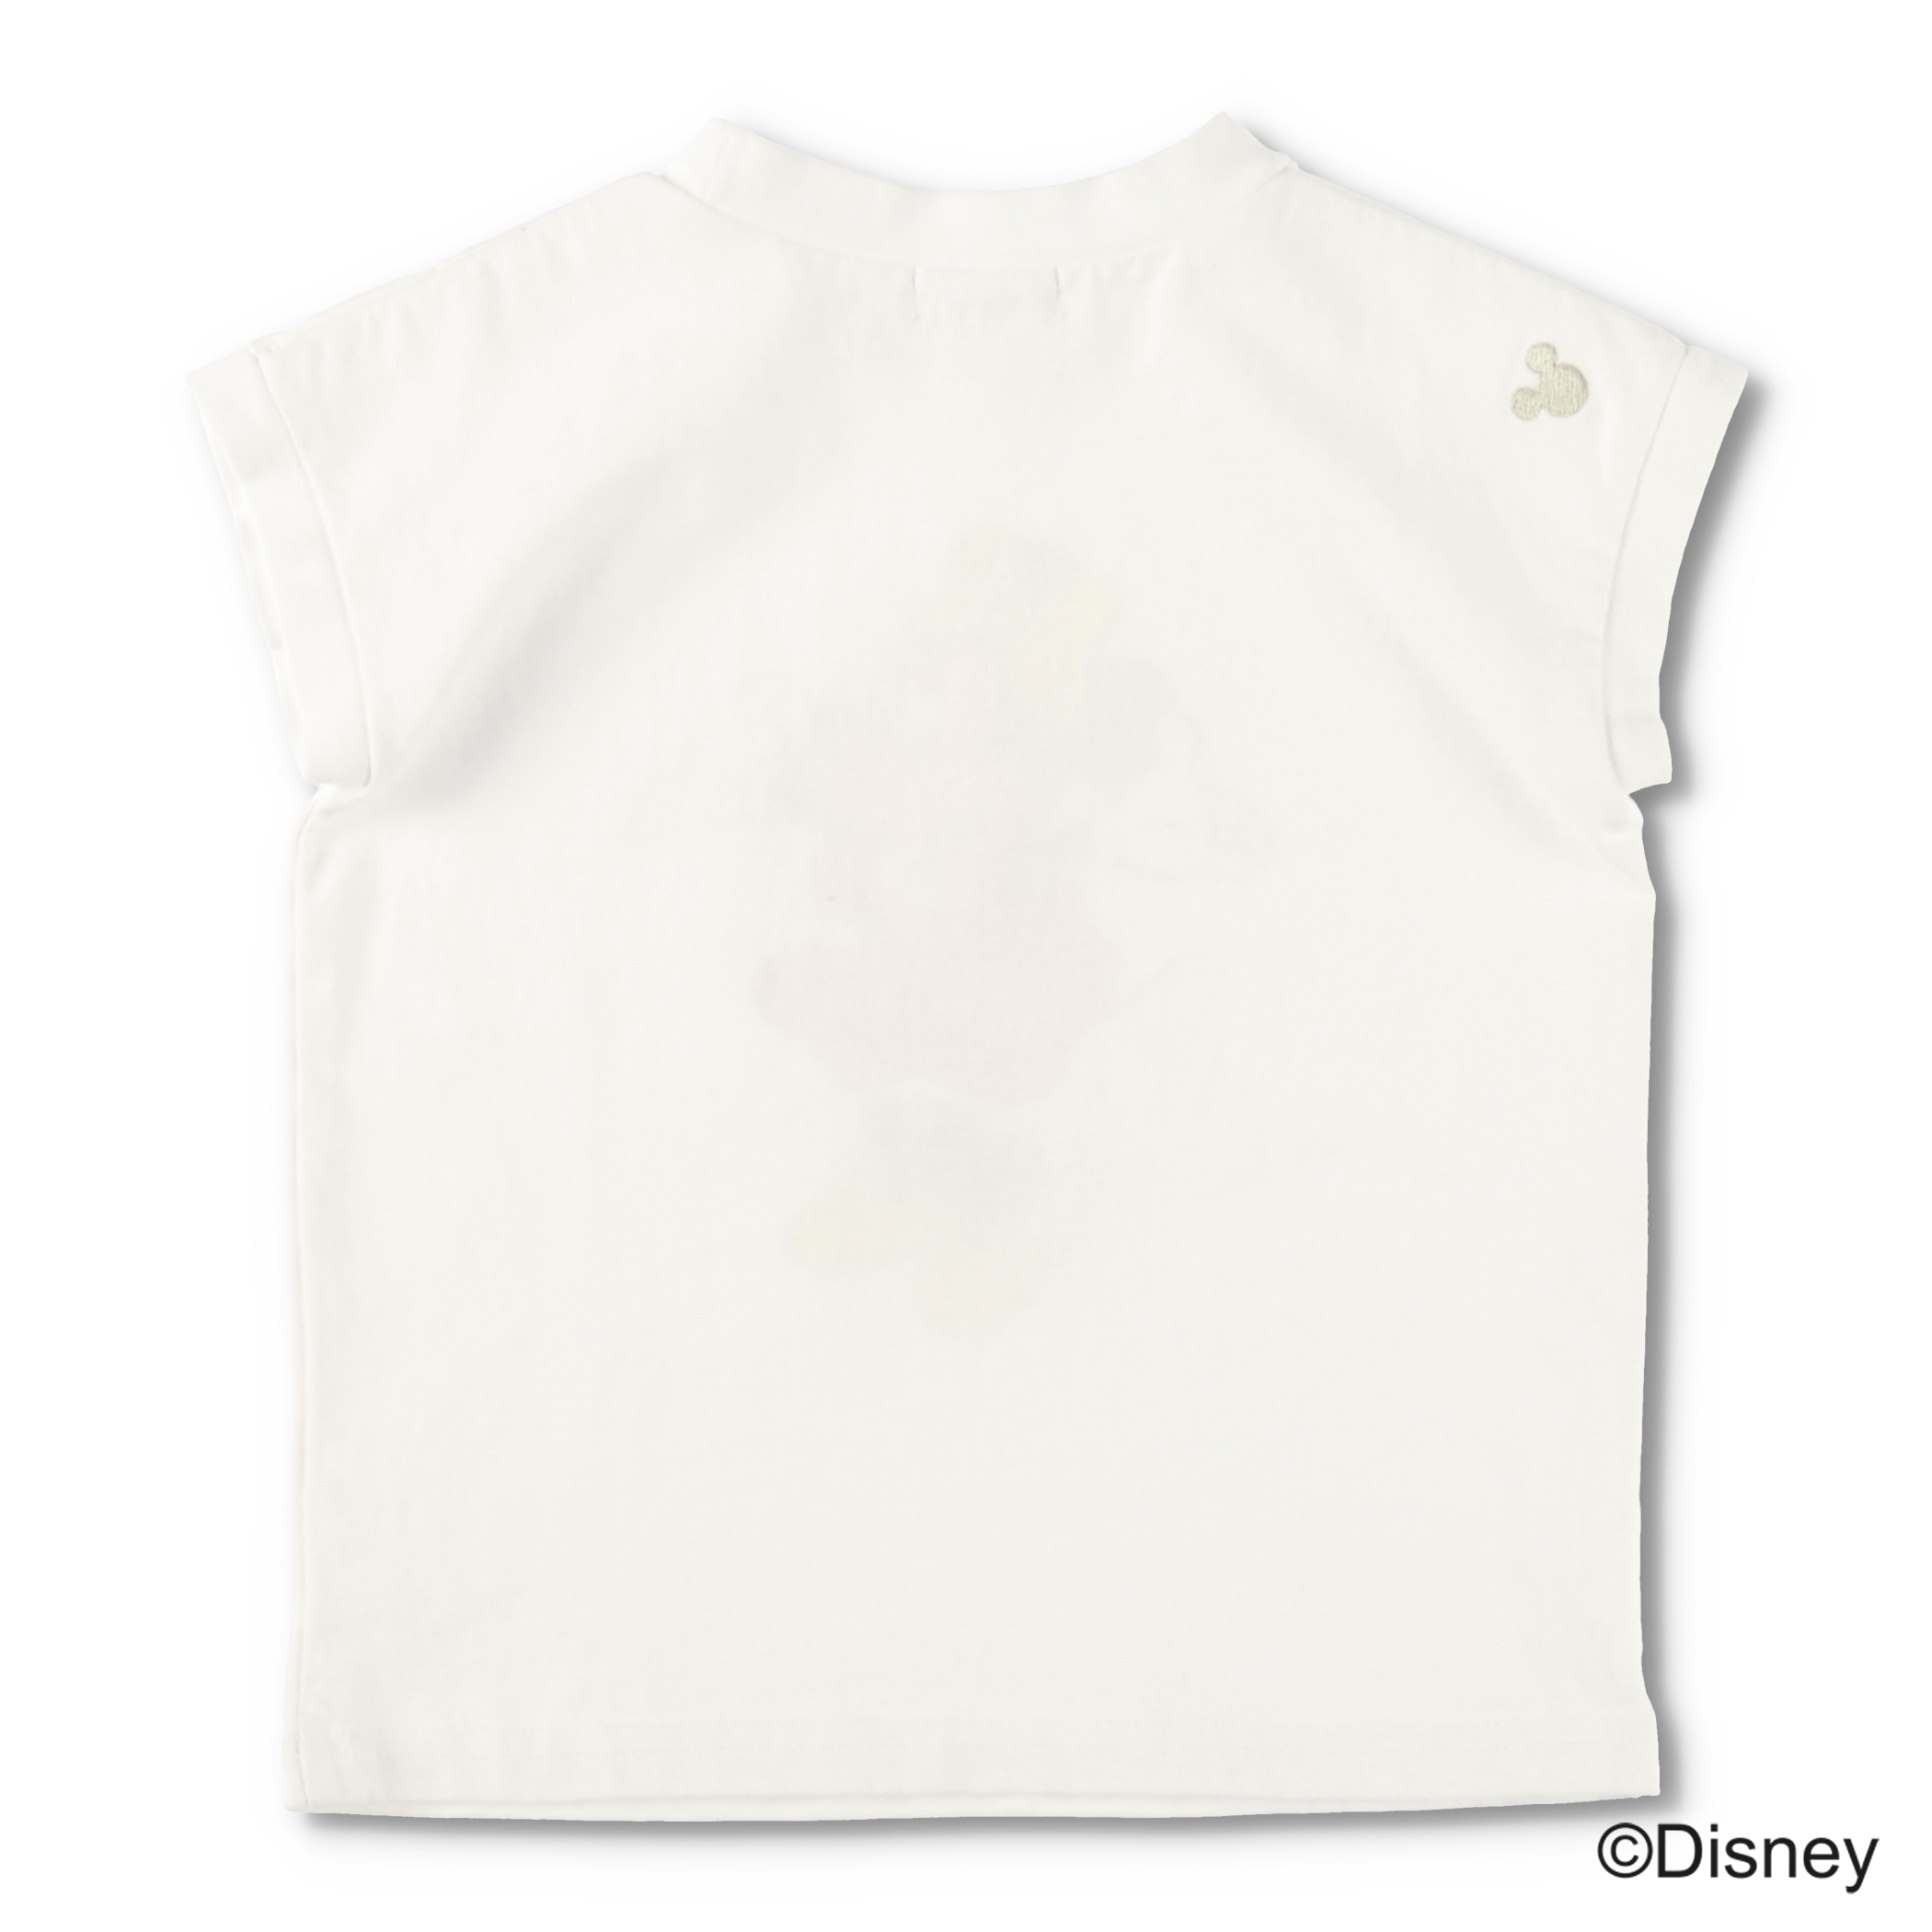 【Disney】フレンチスリーブTシャツ